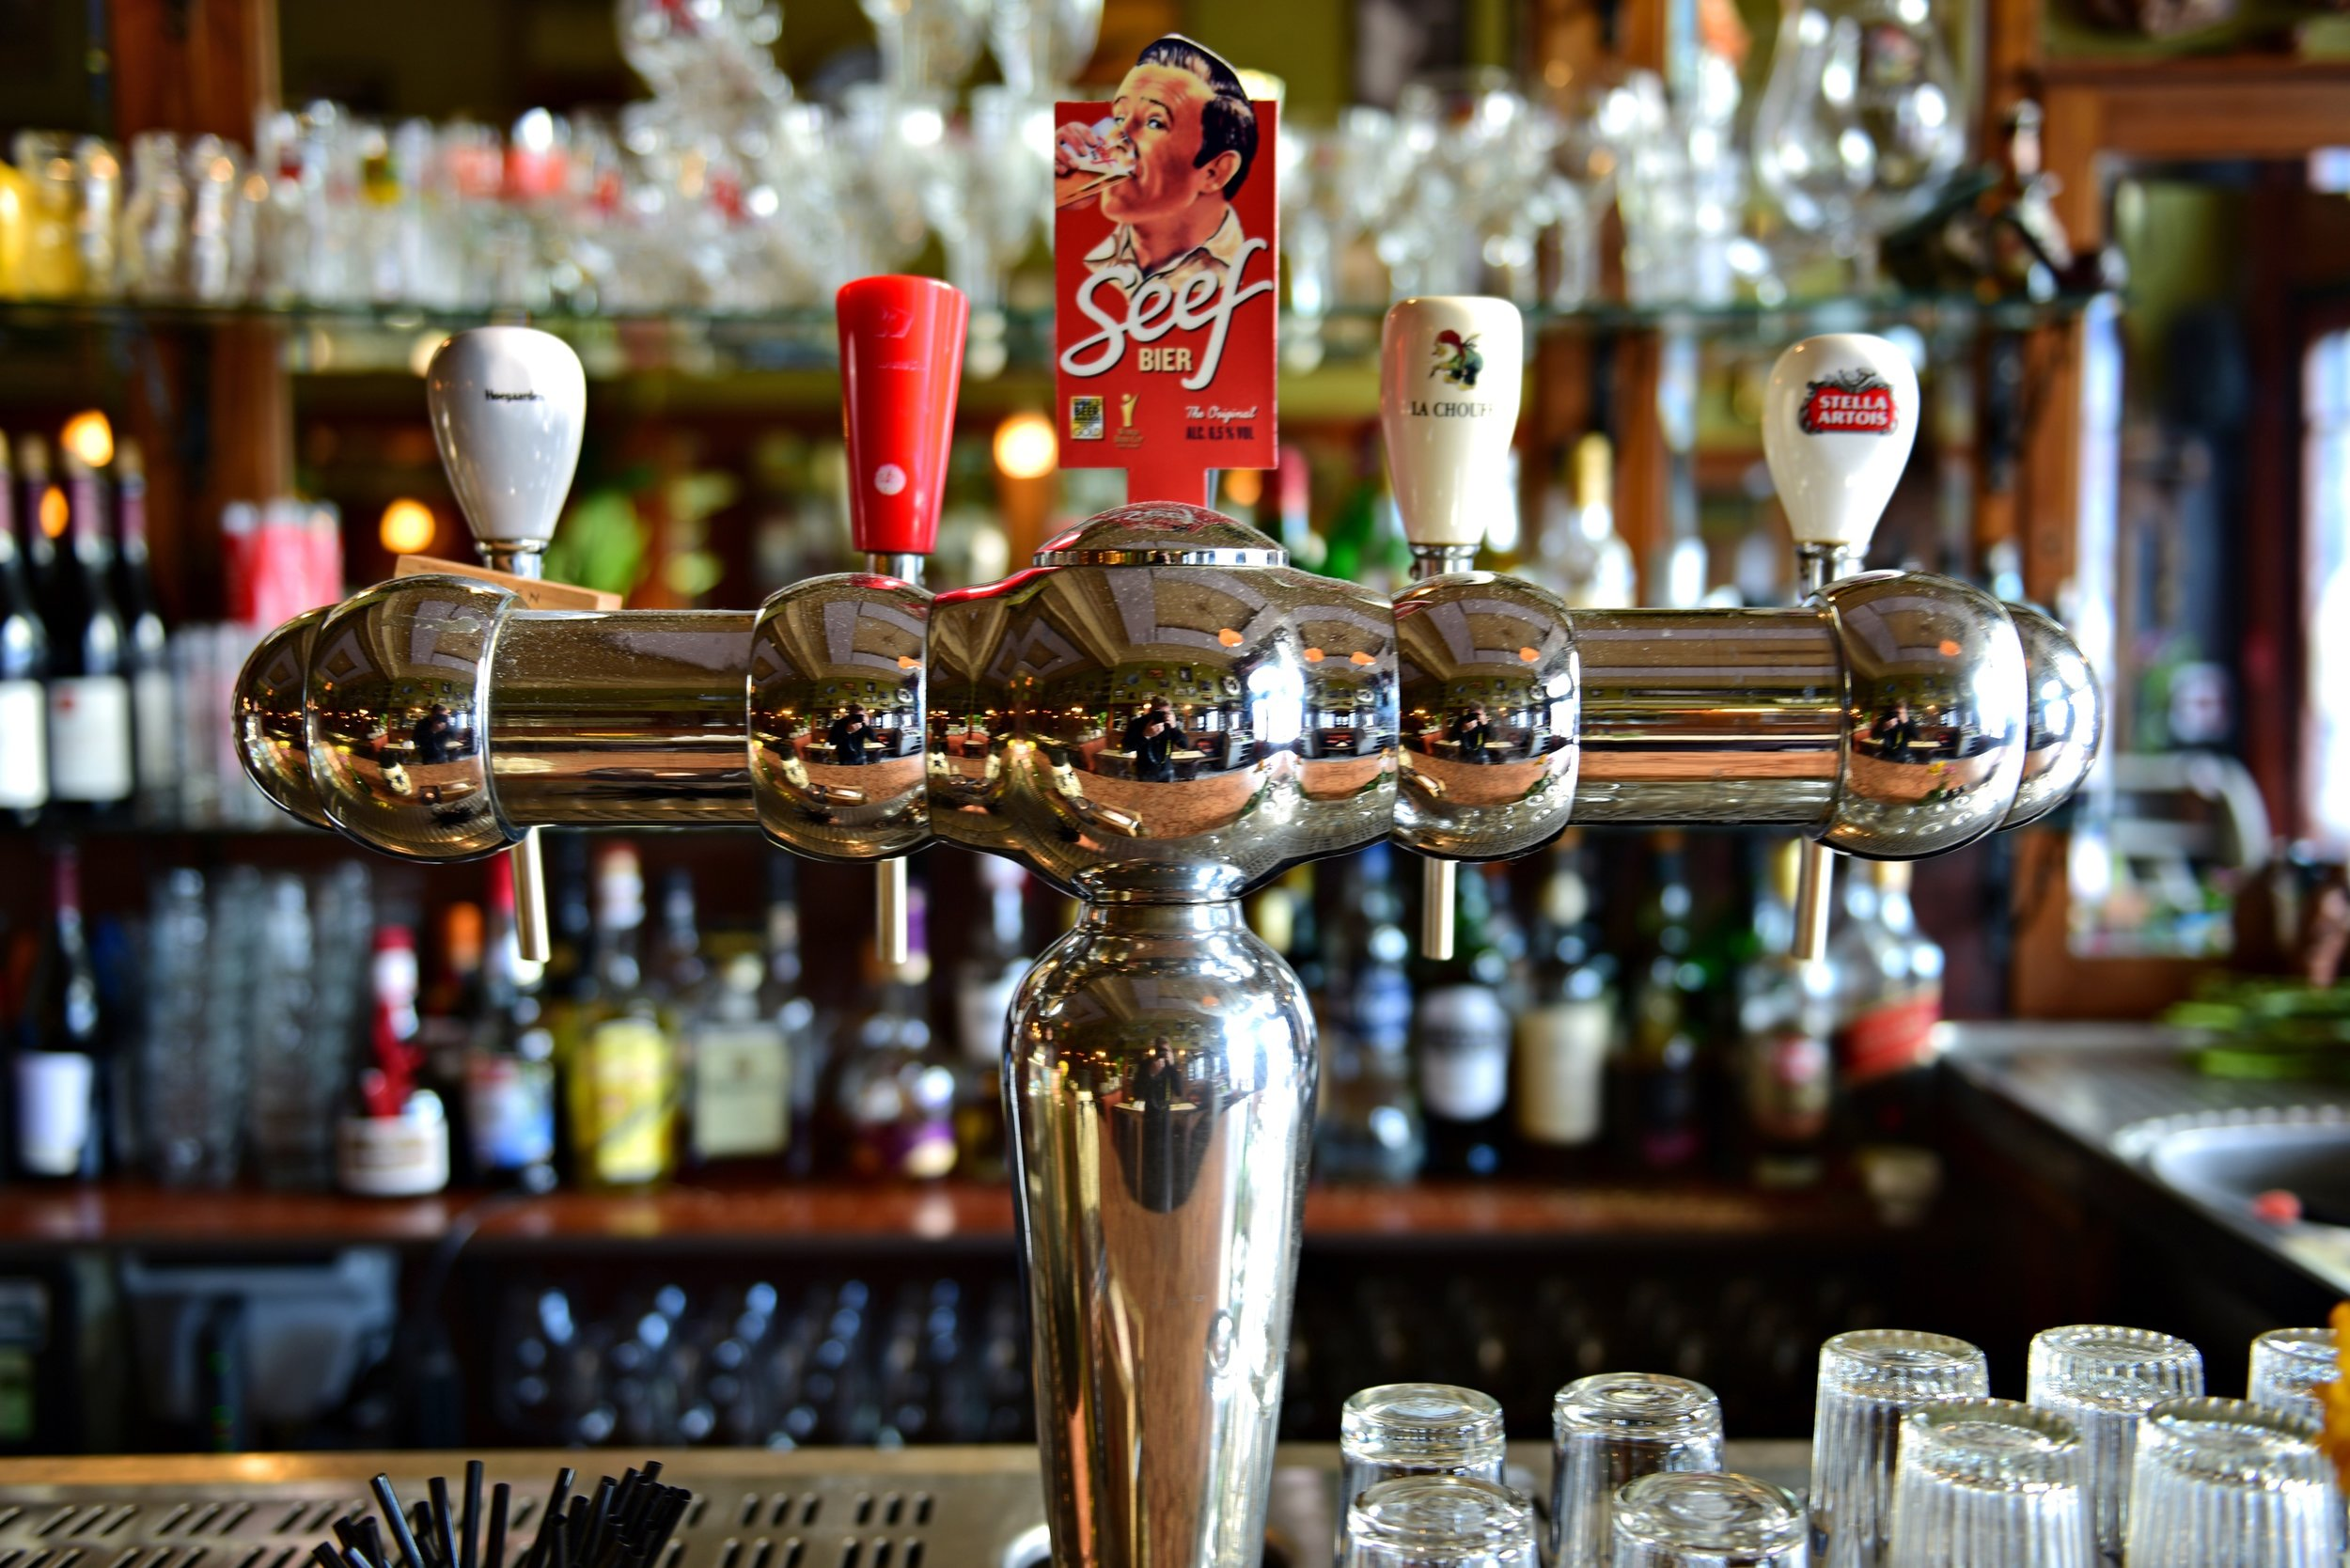 7 la pipe d anvers antwerpen brasserie antwerp best restaurant tablefever.jpg